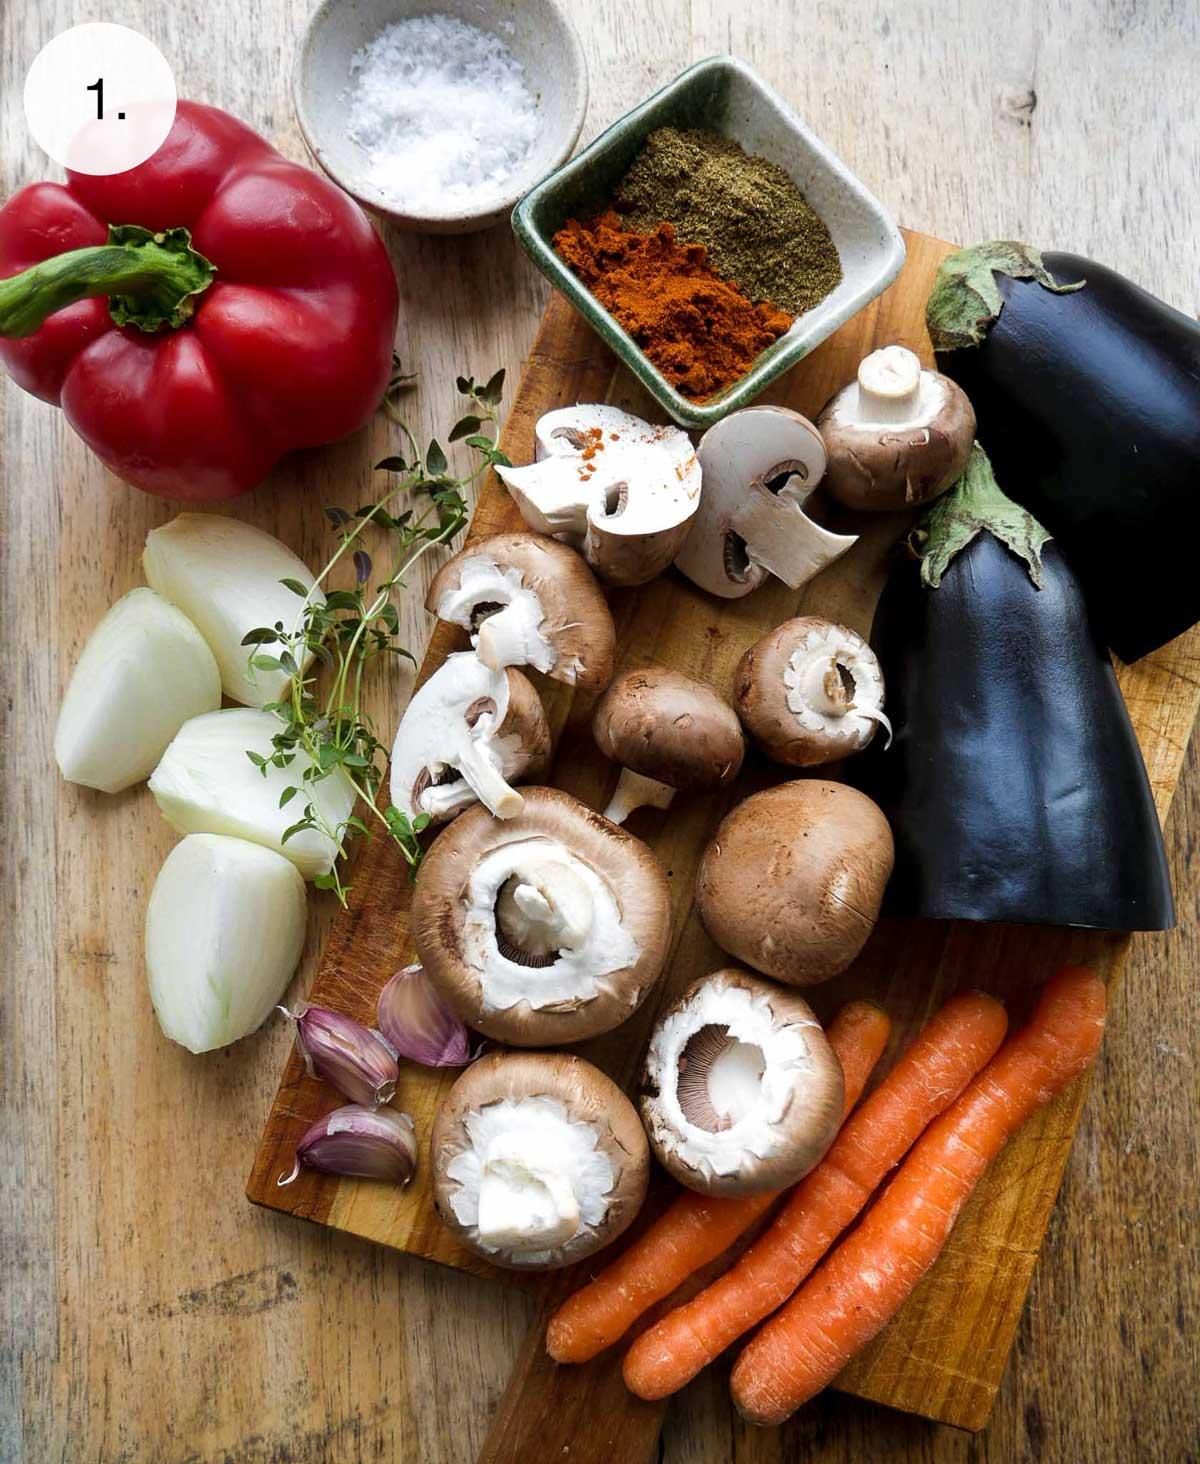 grøntsager til hjemmelavet plantebrød